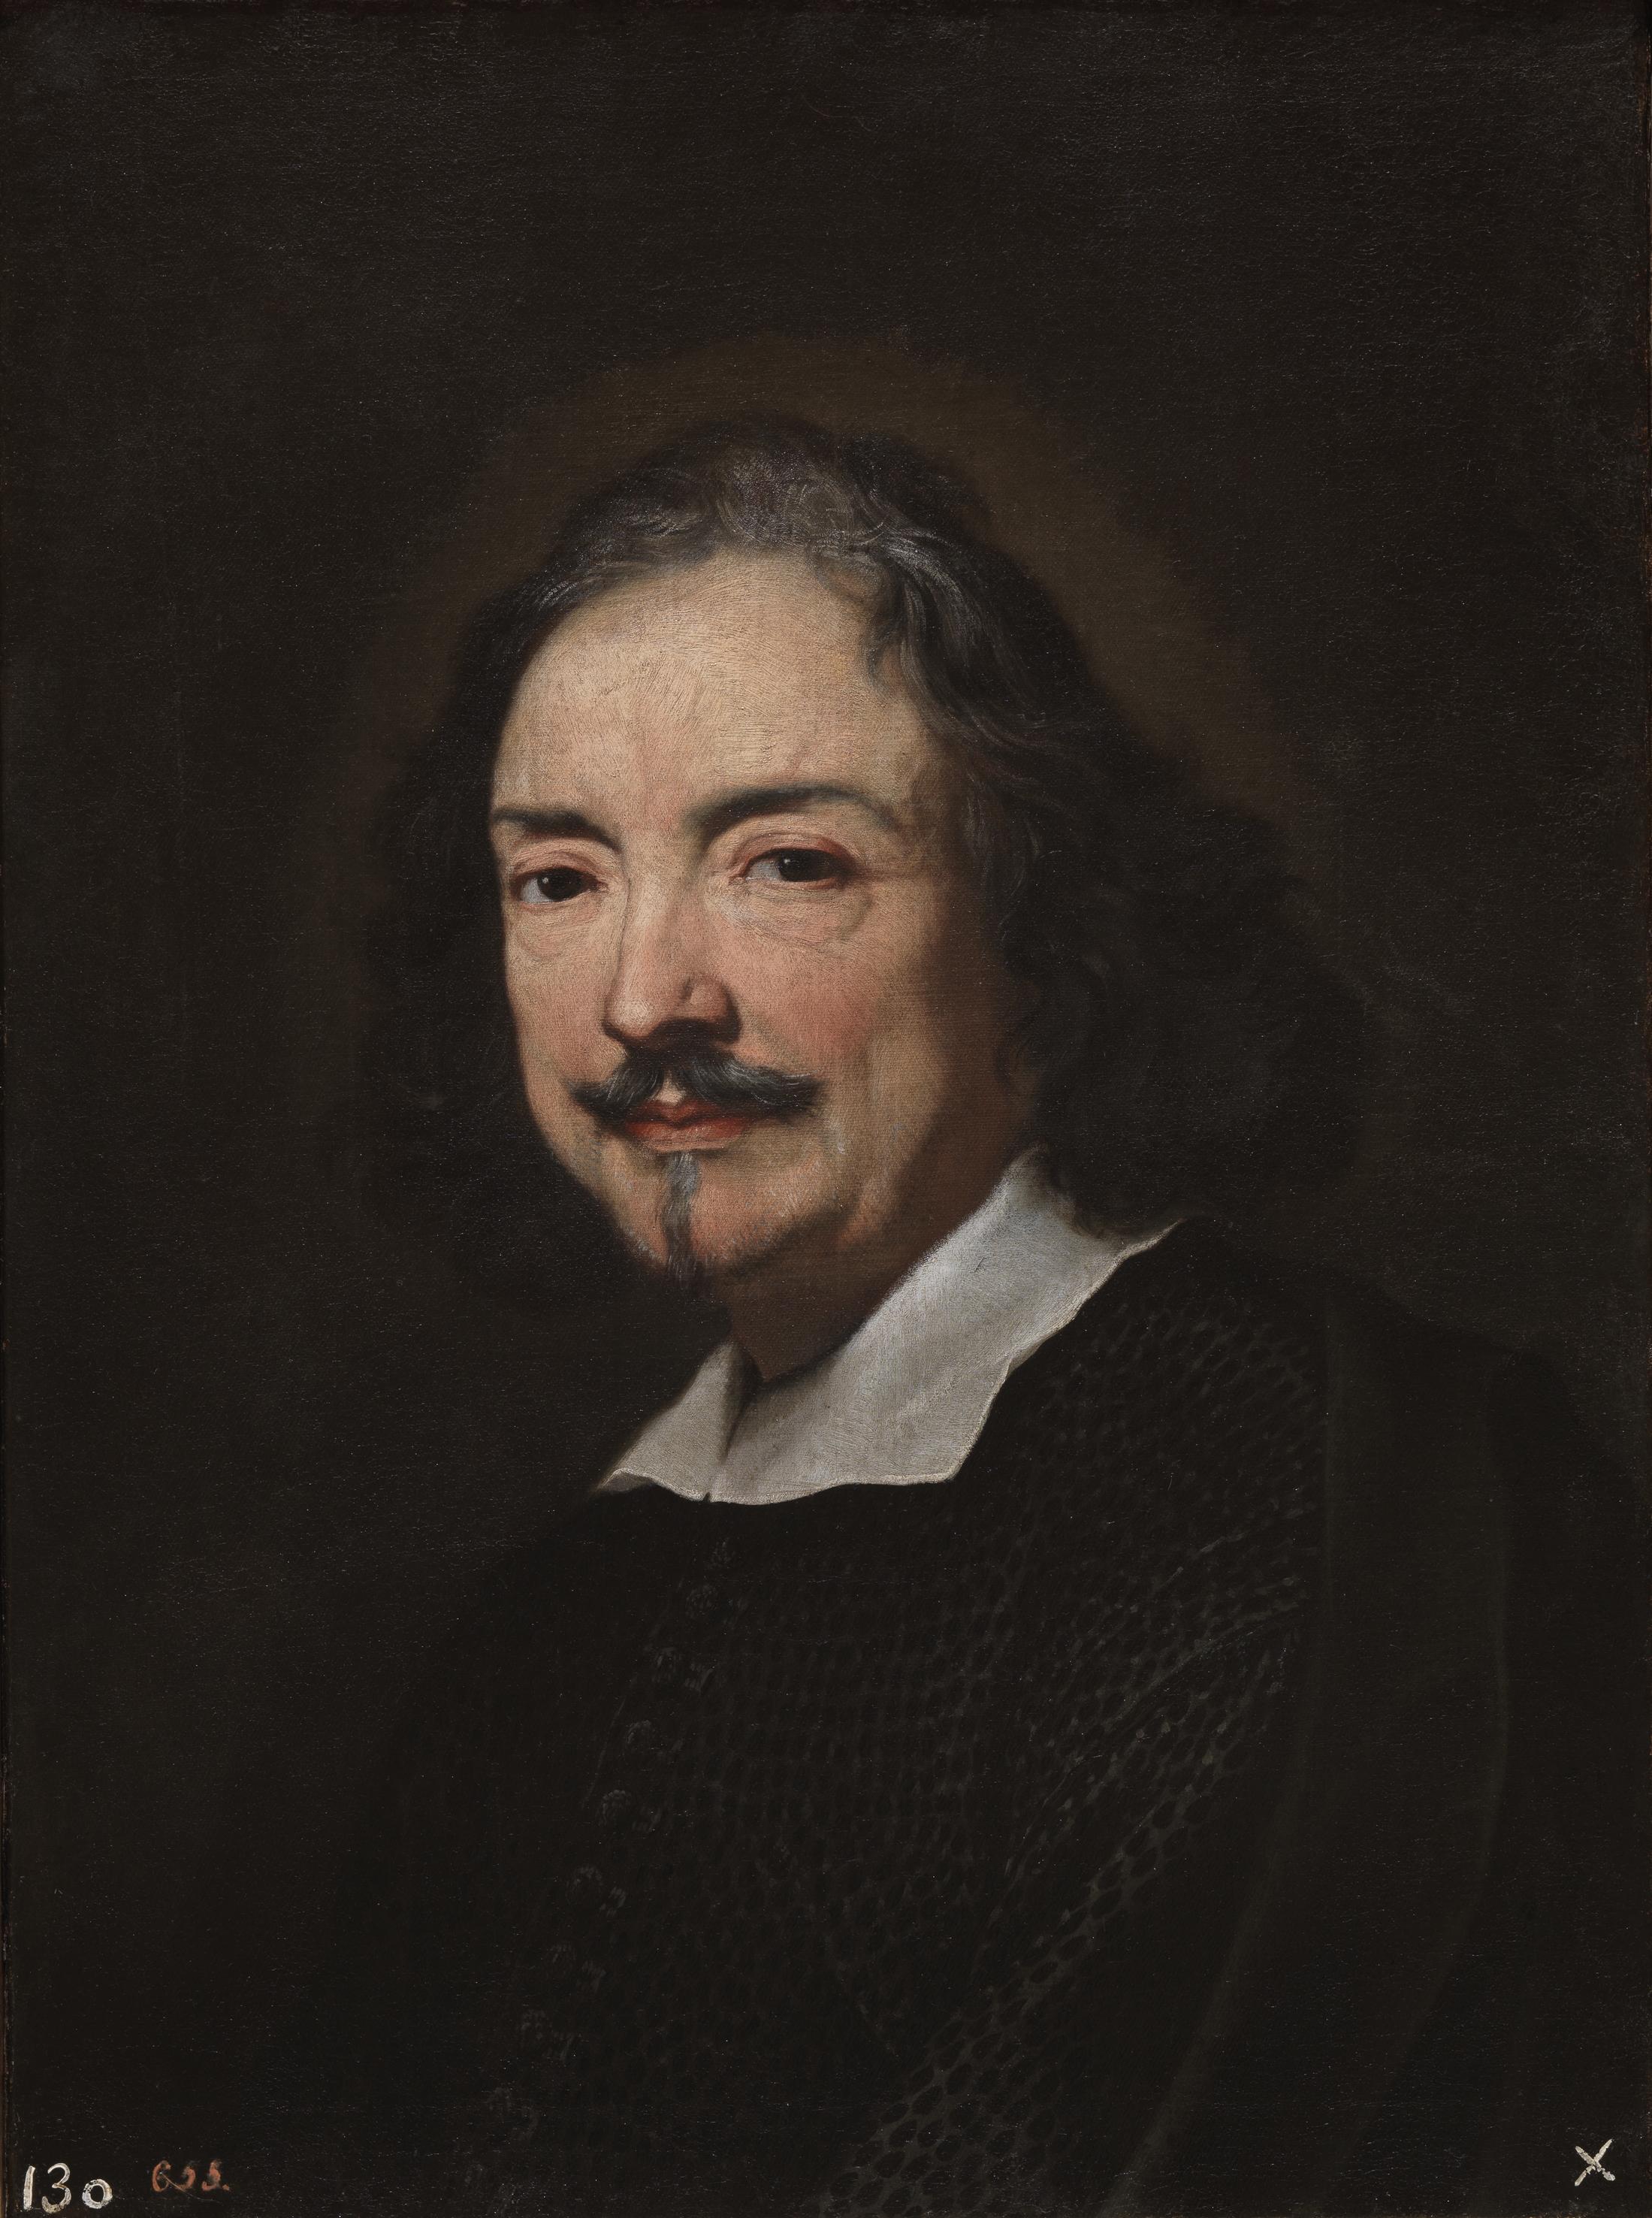 Depiction of Andrea Sacchi